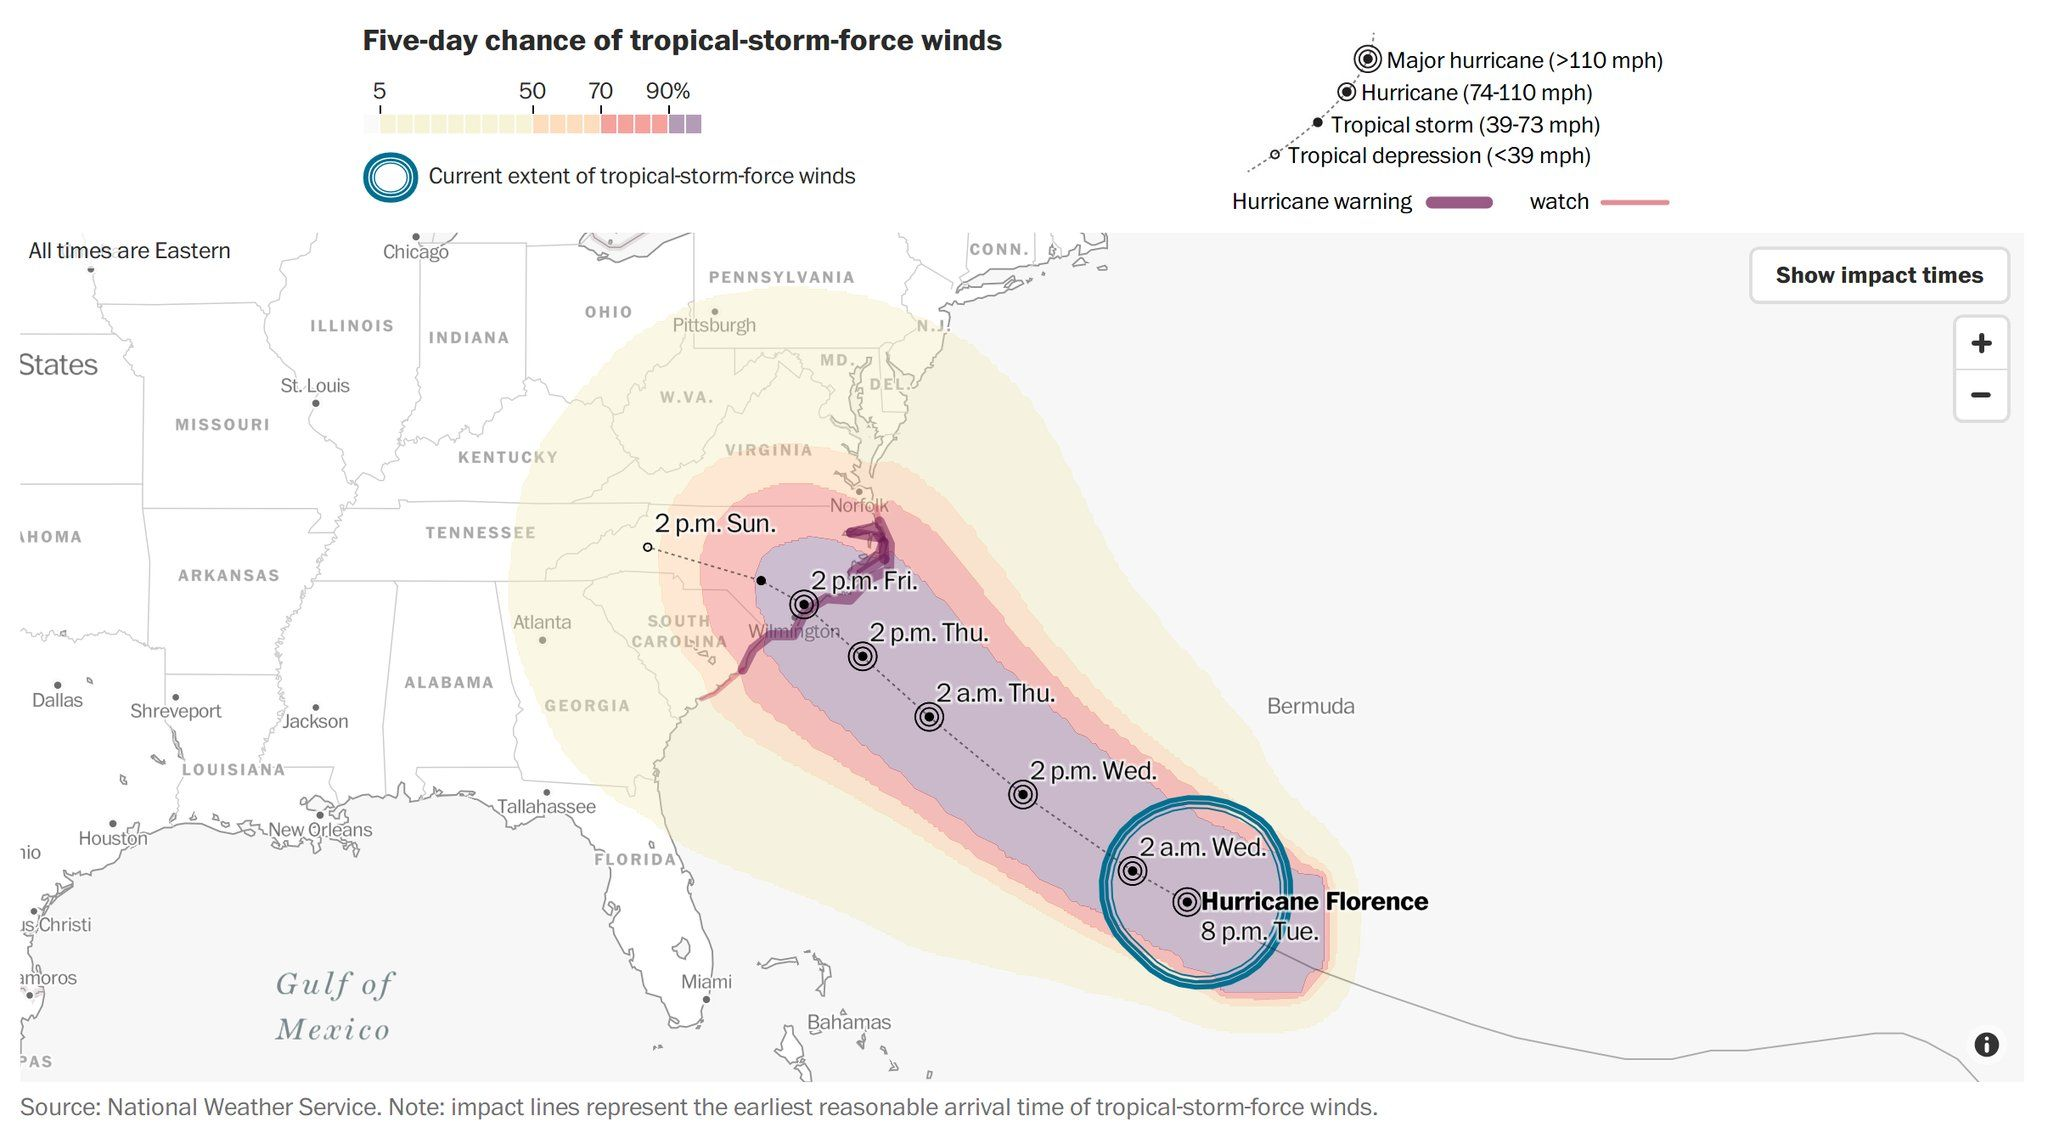 Hurricane Florence Washington Post Hurricane Illinois State Tropical Storm